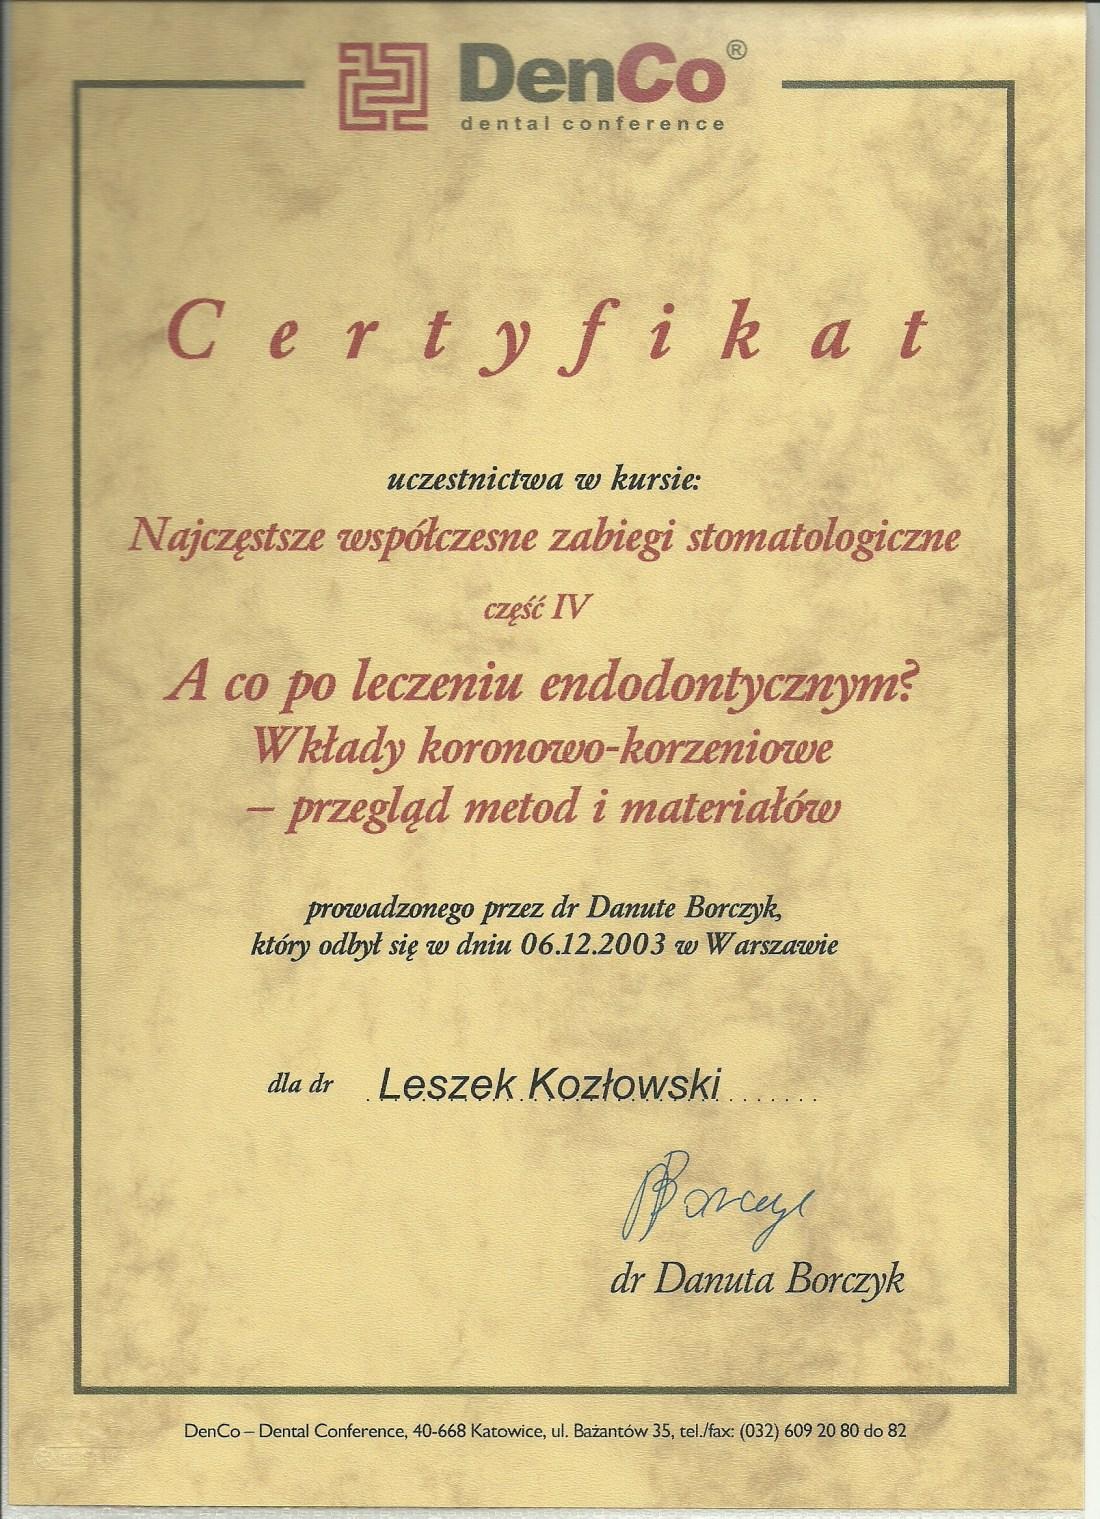 dentysta warszawa DENTYSTA WARSZAWA – DENTOKLINIKA Dentysta warszawa Leszek Kozlowski Certyfikat 19